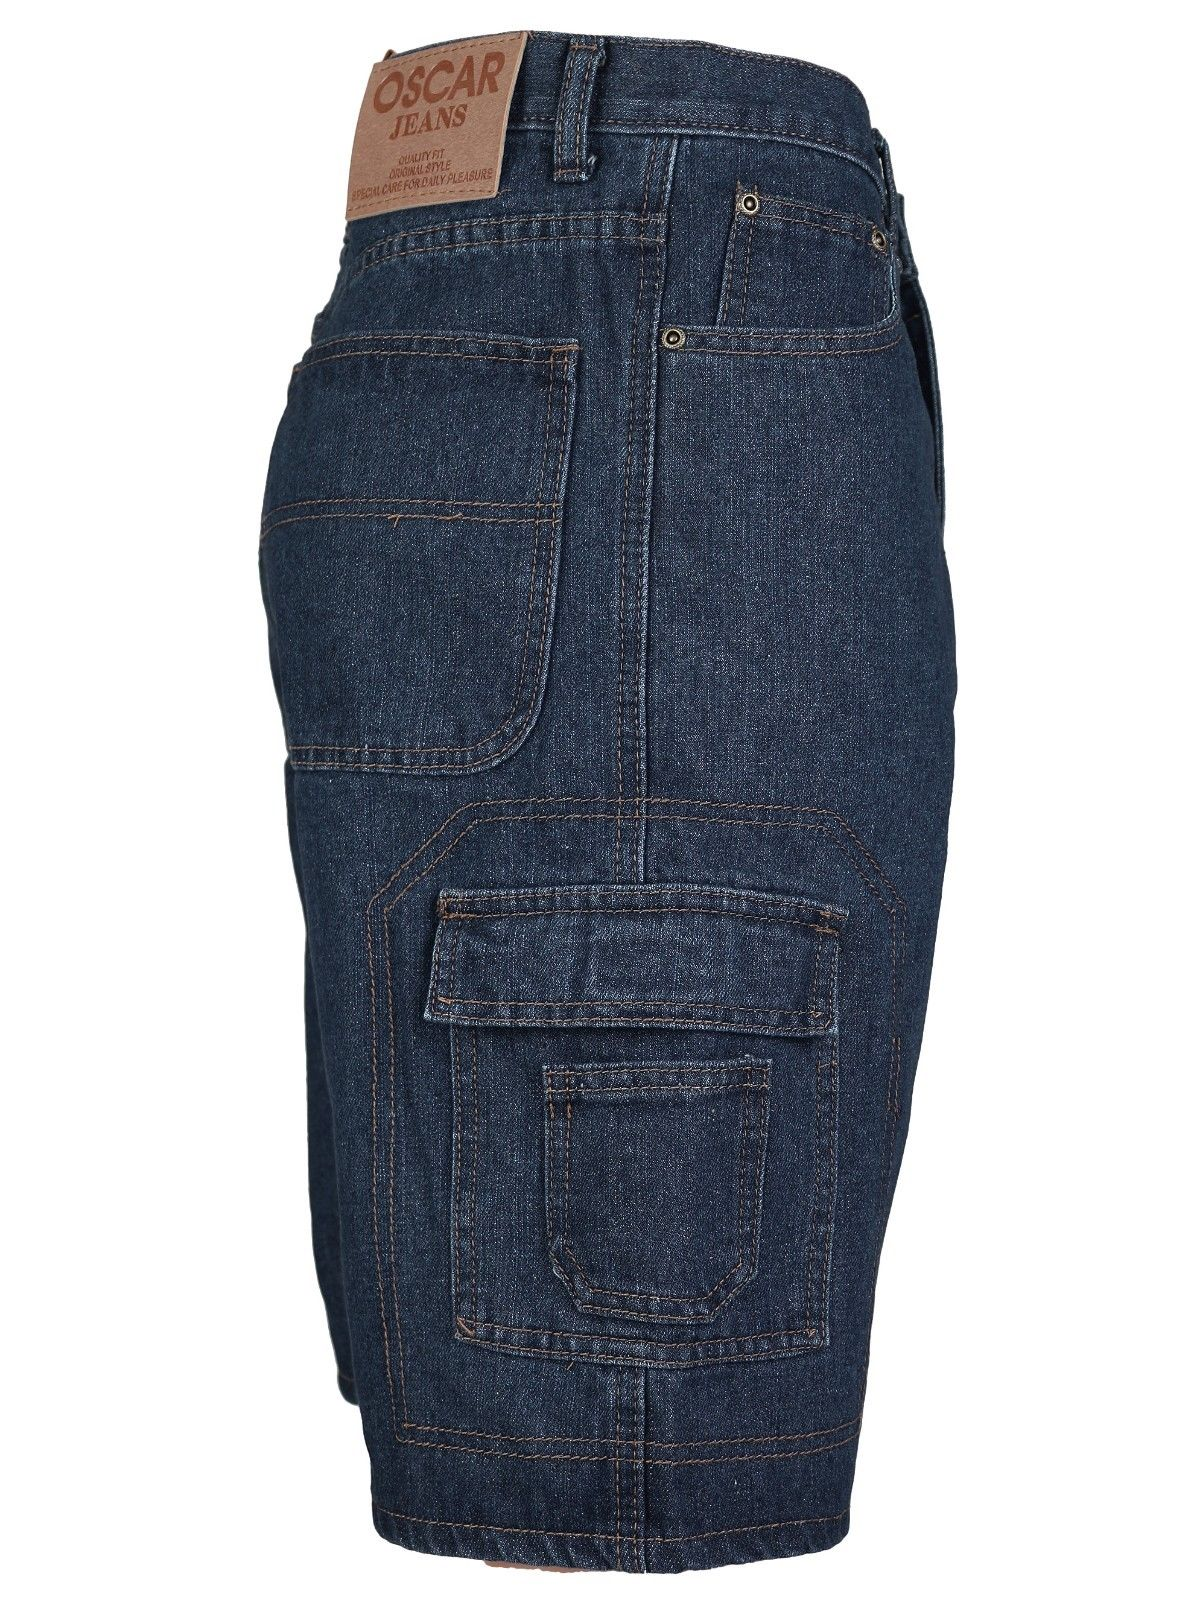 Men-039-s-Premium-Cotton-Multi-Pocket-Relaxed-Fit-Stonewash-Denim-Jean-Cargo-Shorts thumbnail 13